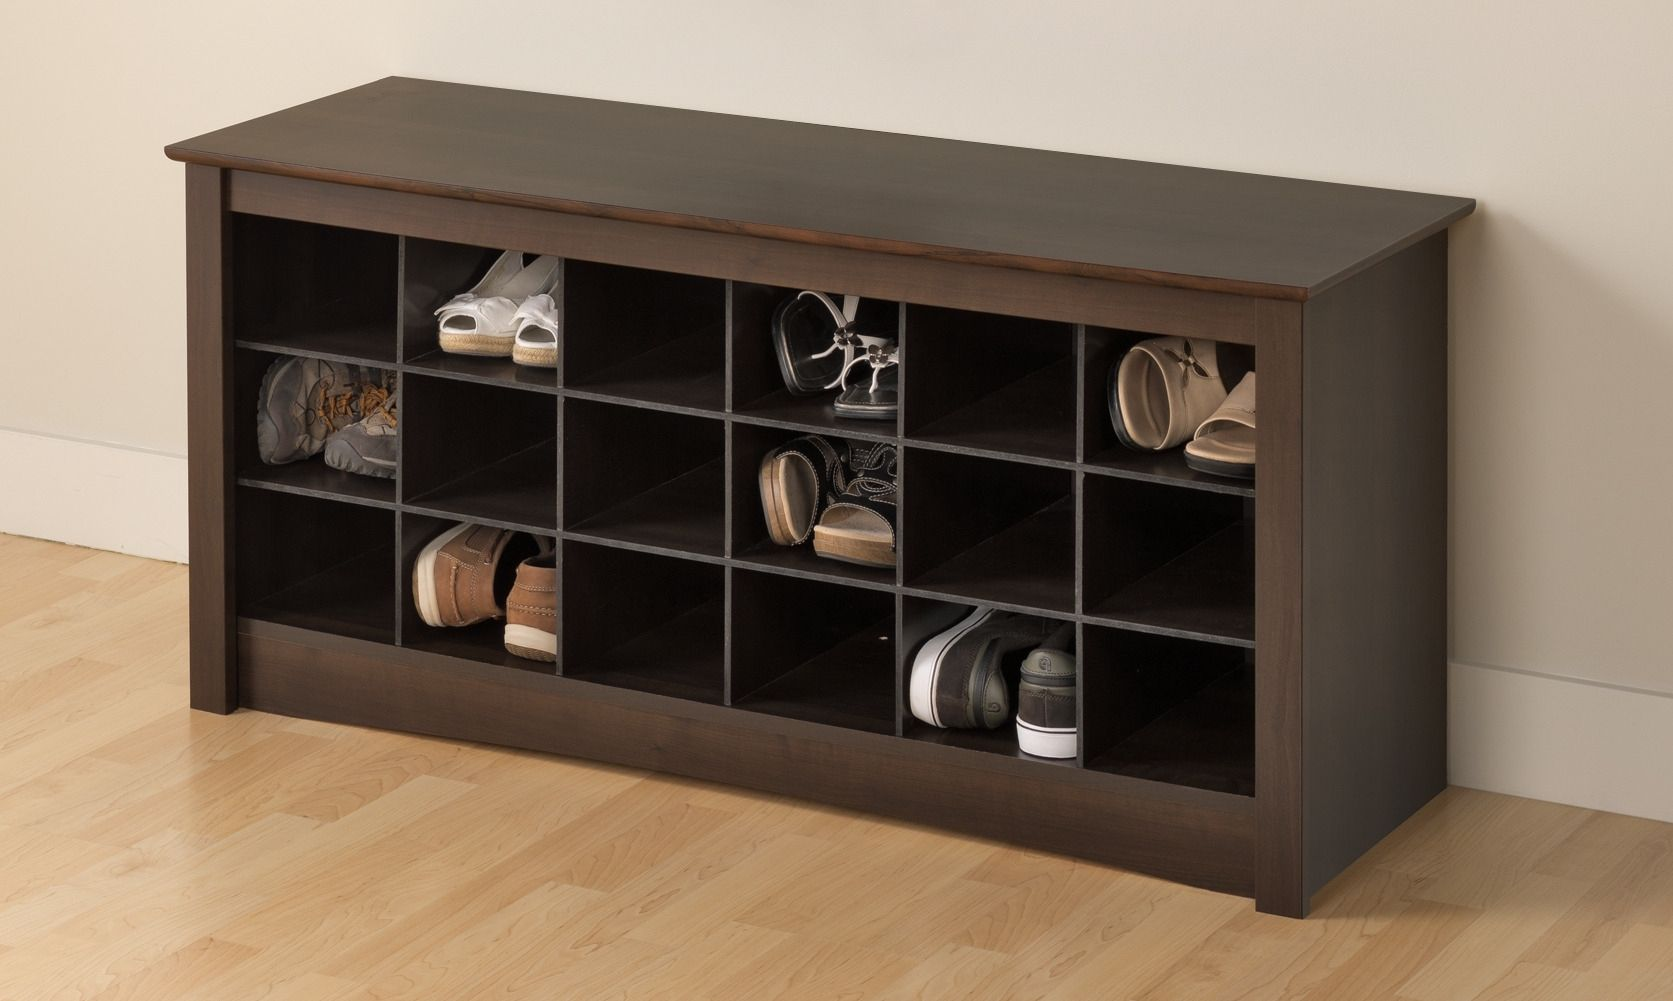 Shoe Racks For Living Room Shoe Storage Espresso Cubbie ...